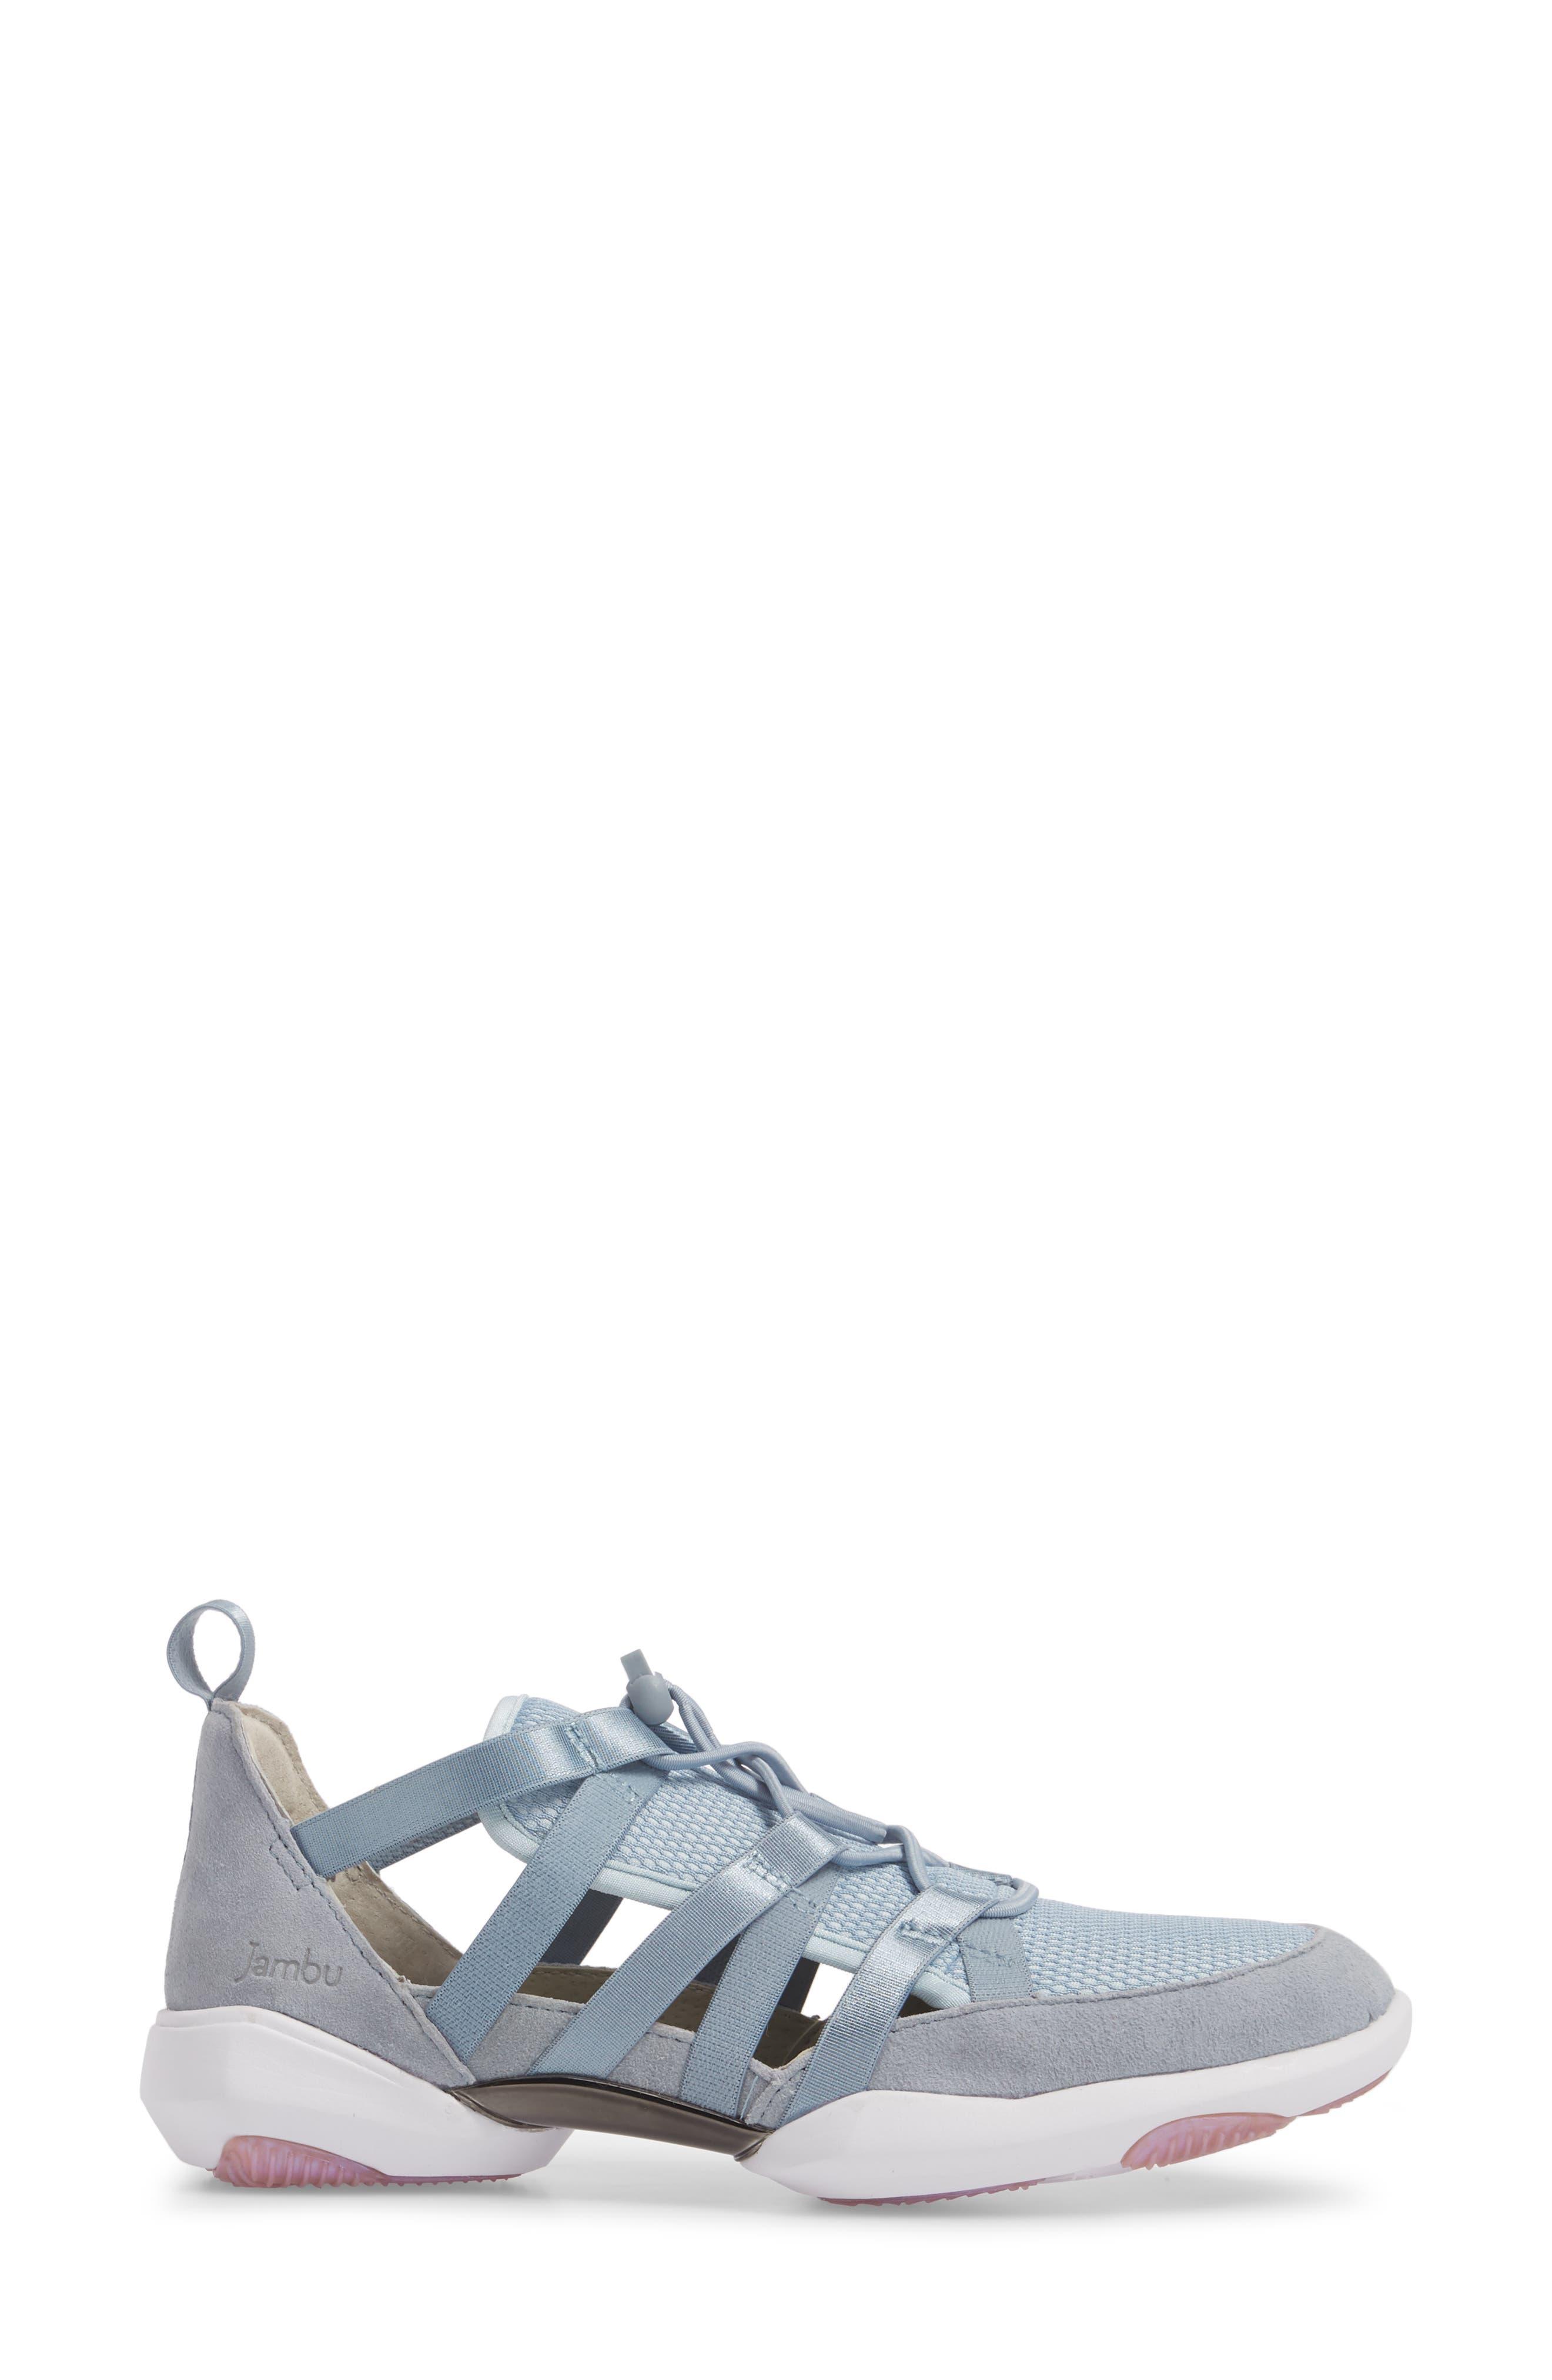 Azalea Sneaker,                             Alternate thumbnail 3, color,                             BLUE LEATHER